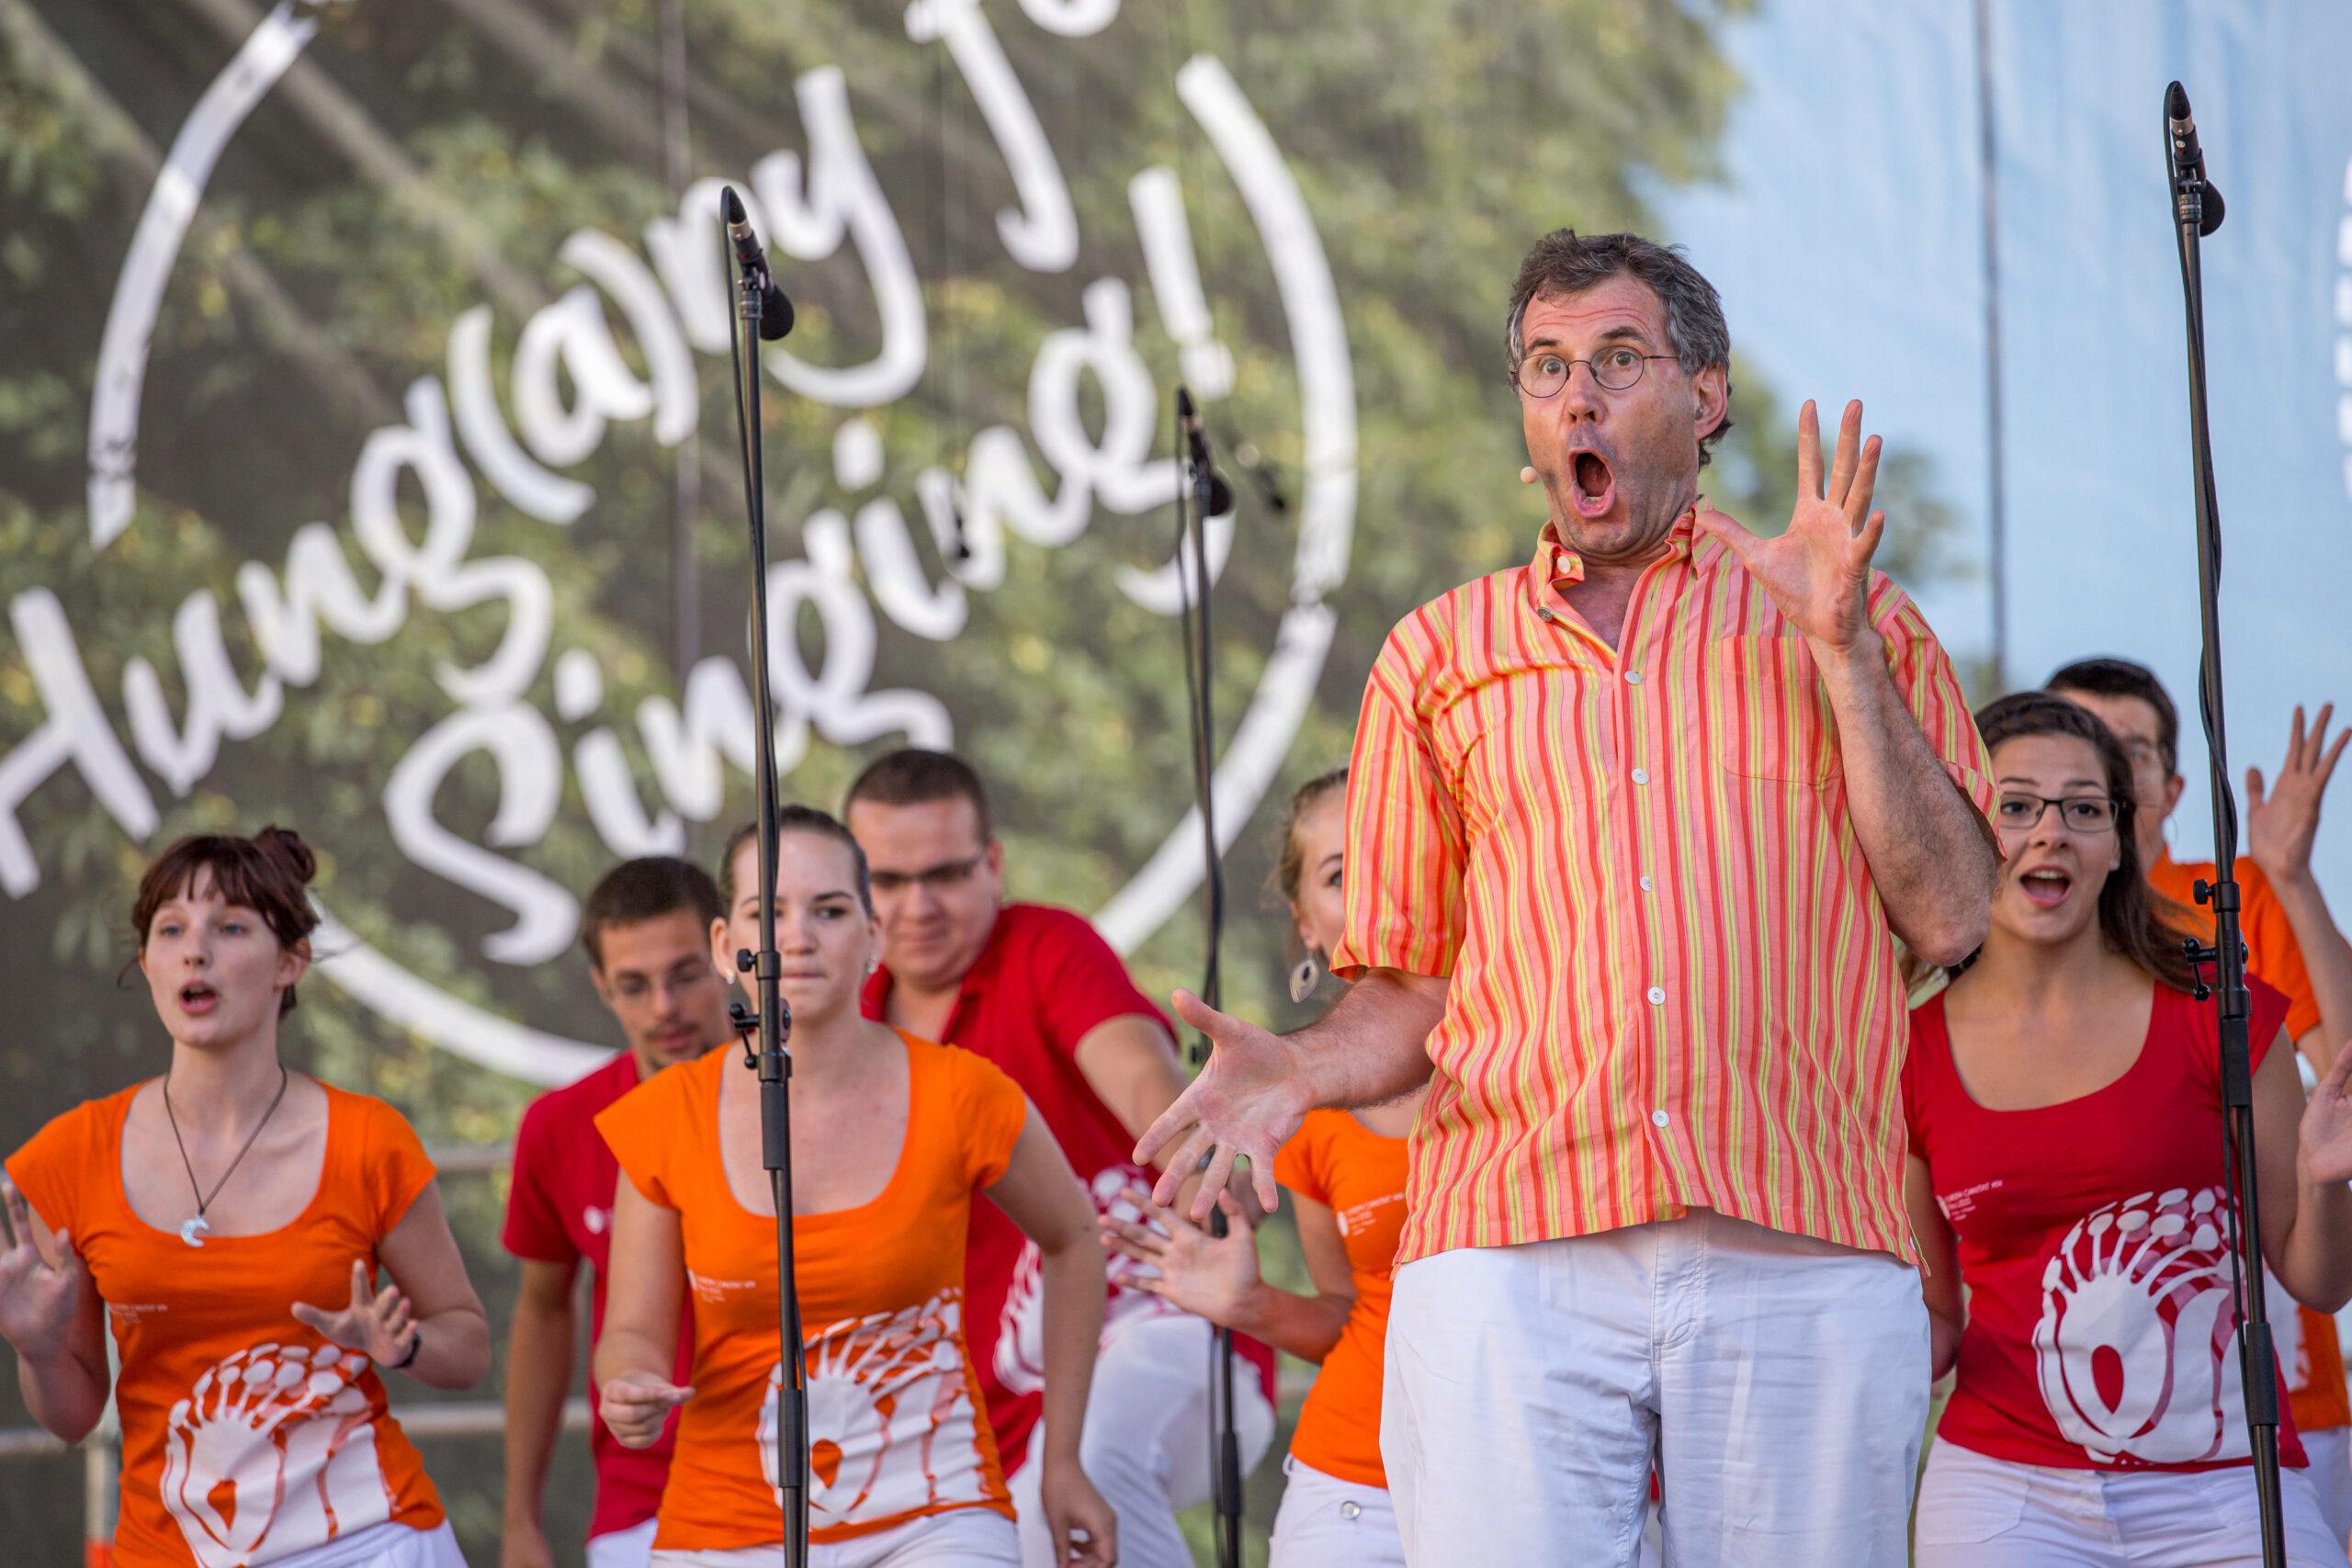 Márton Rónási, Madžarska: Hung(a)ry Singing, 2015, Madžarska - All Hung(a)ry for singing … at the Europa Cantat Festival in Pécs, Hungary.